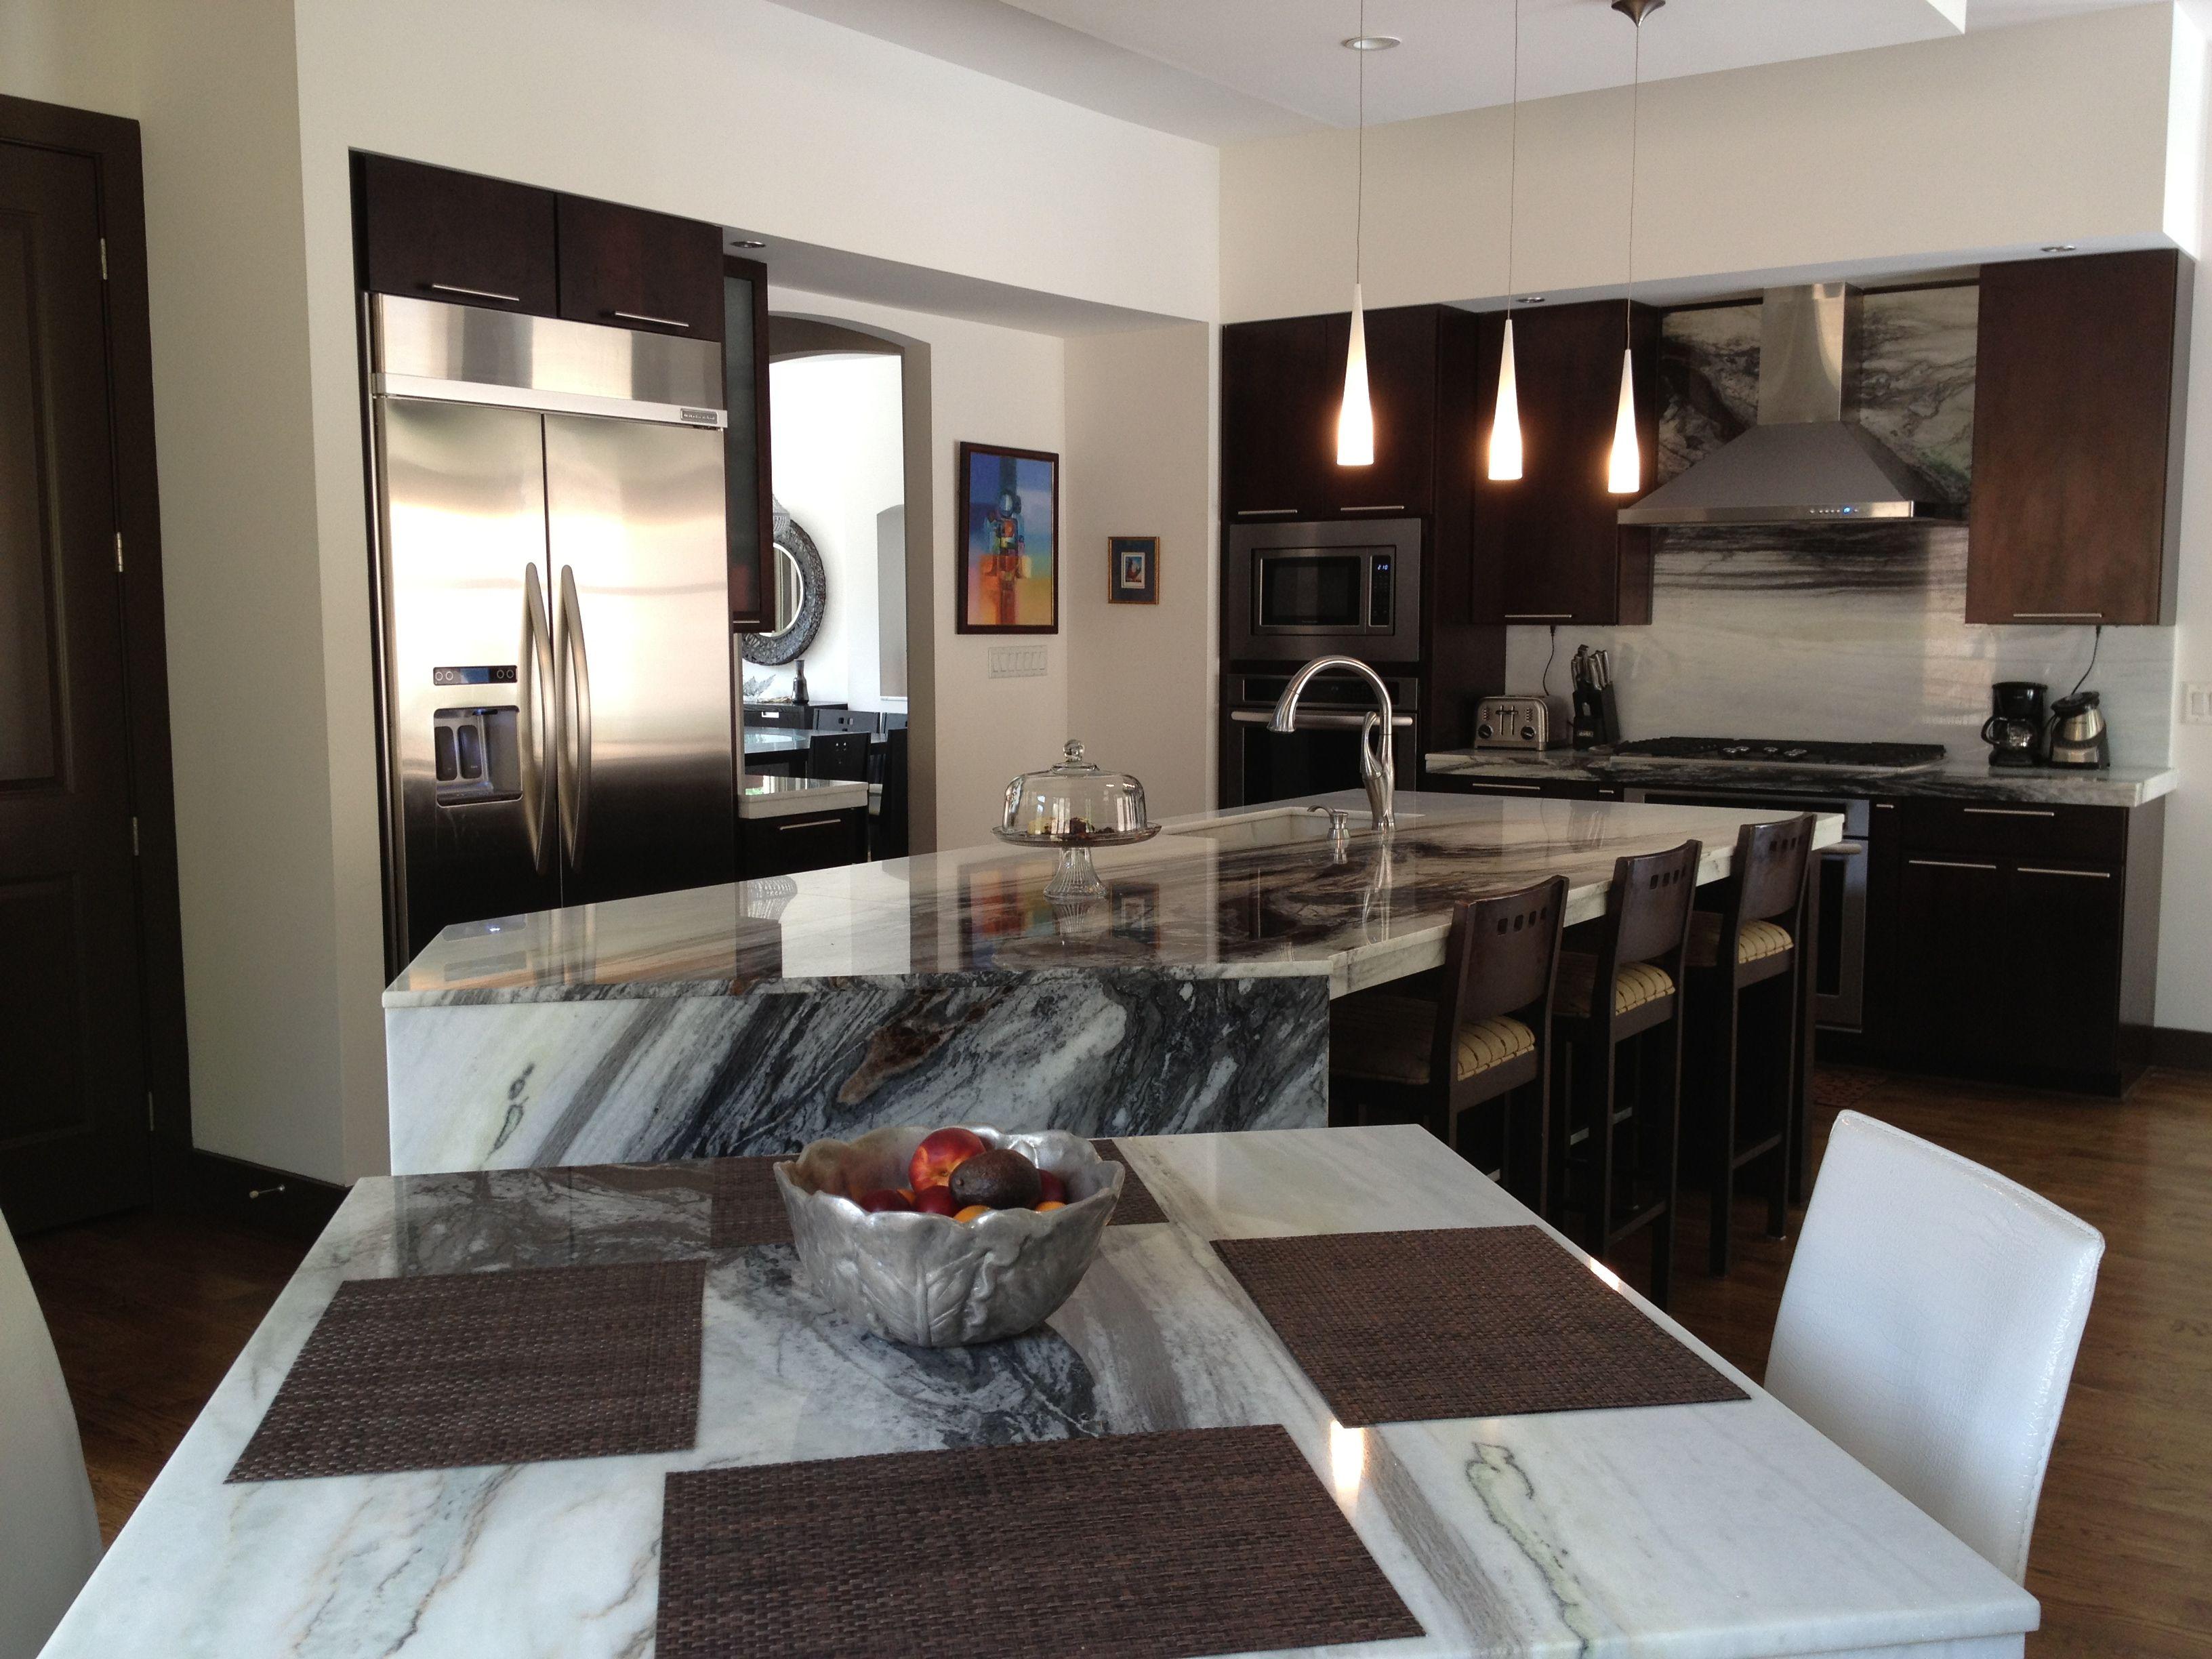 Kitchen Design Gallery Distinctive Designs in Greensboro